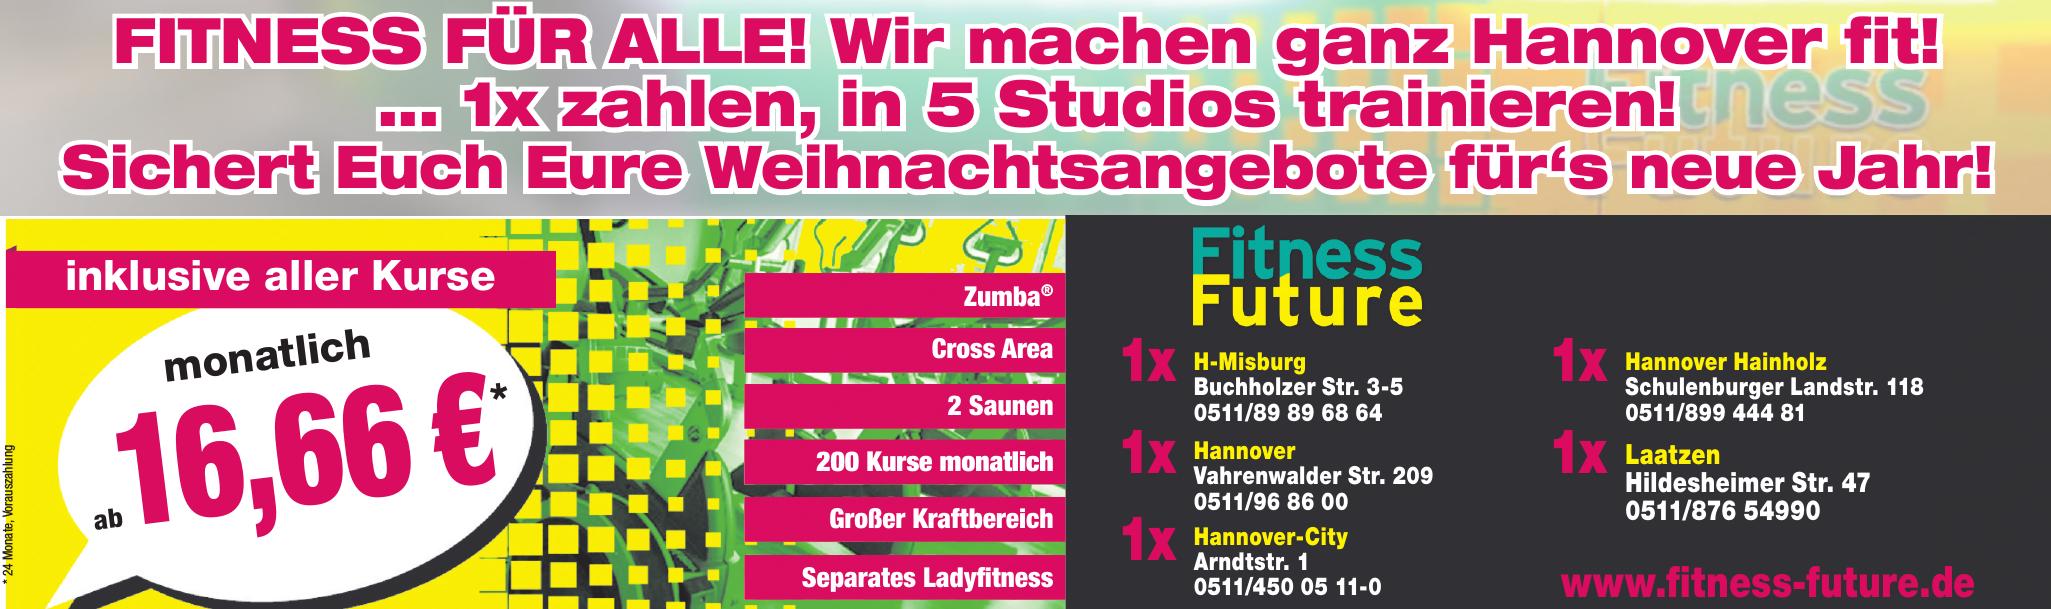 Fitness Future GmbH